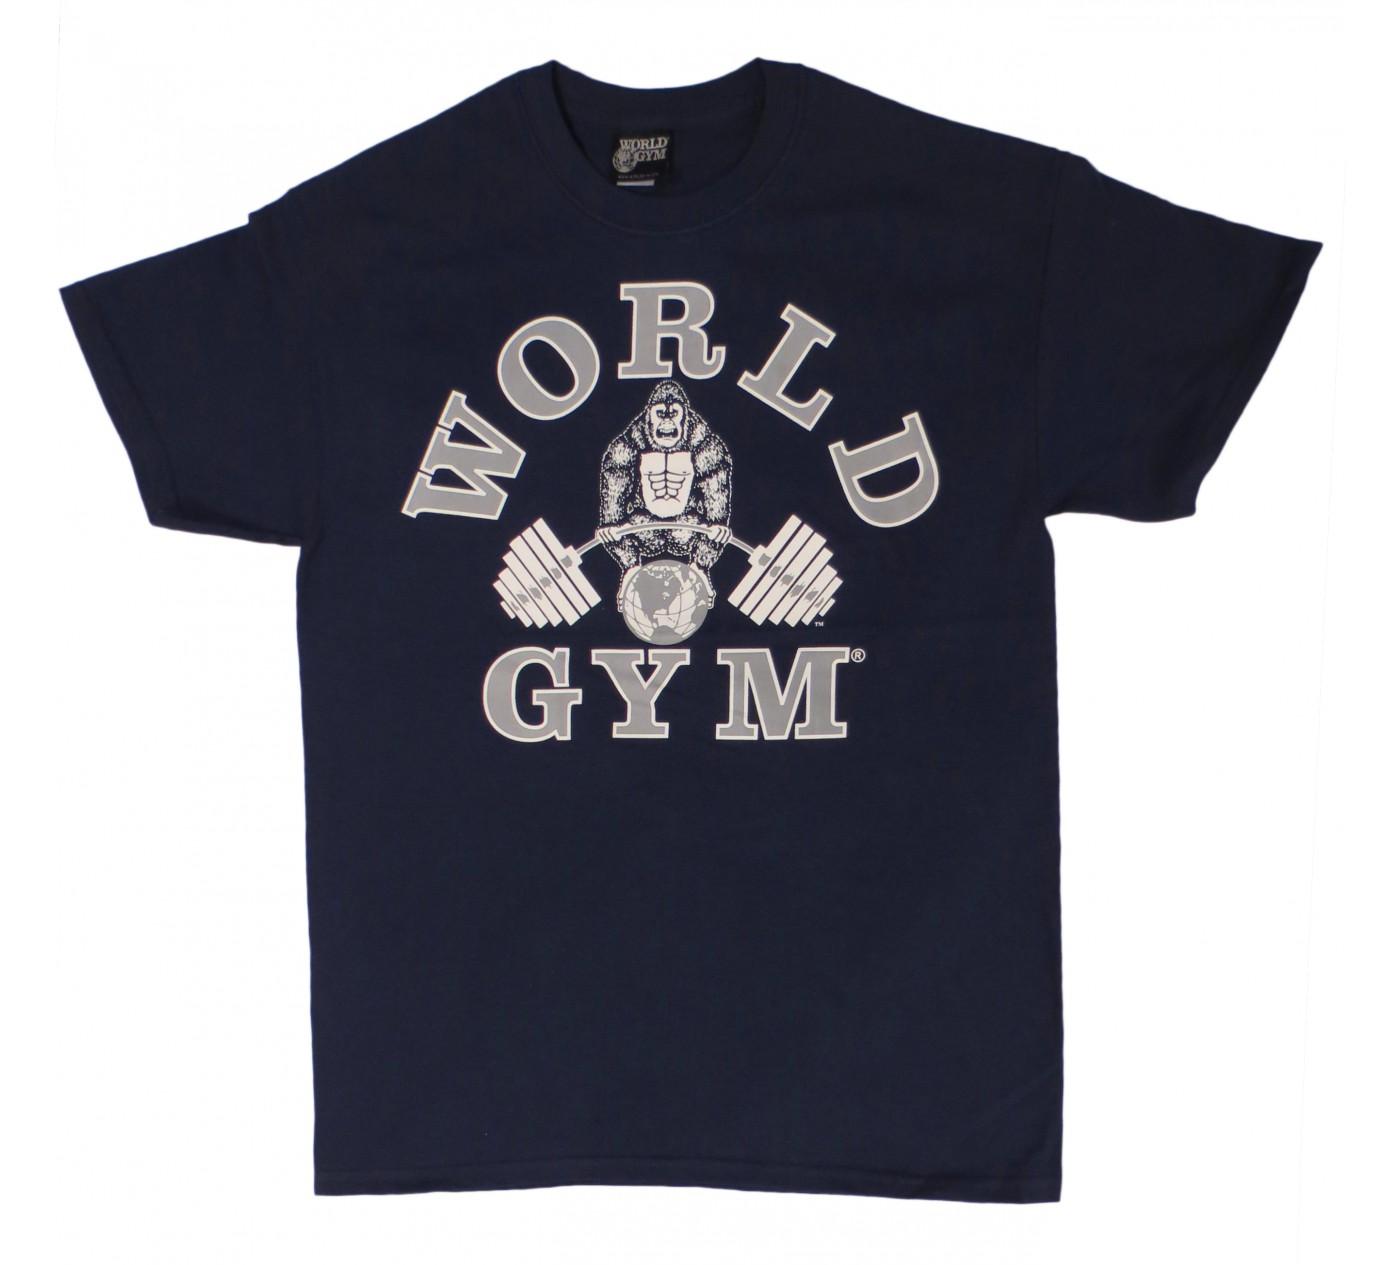 W101 World Gym Bodybuilding T Shirt